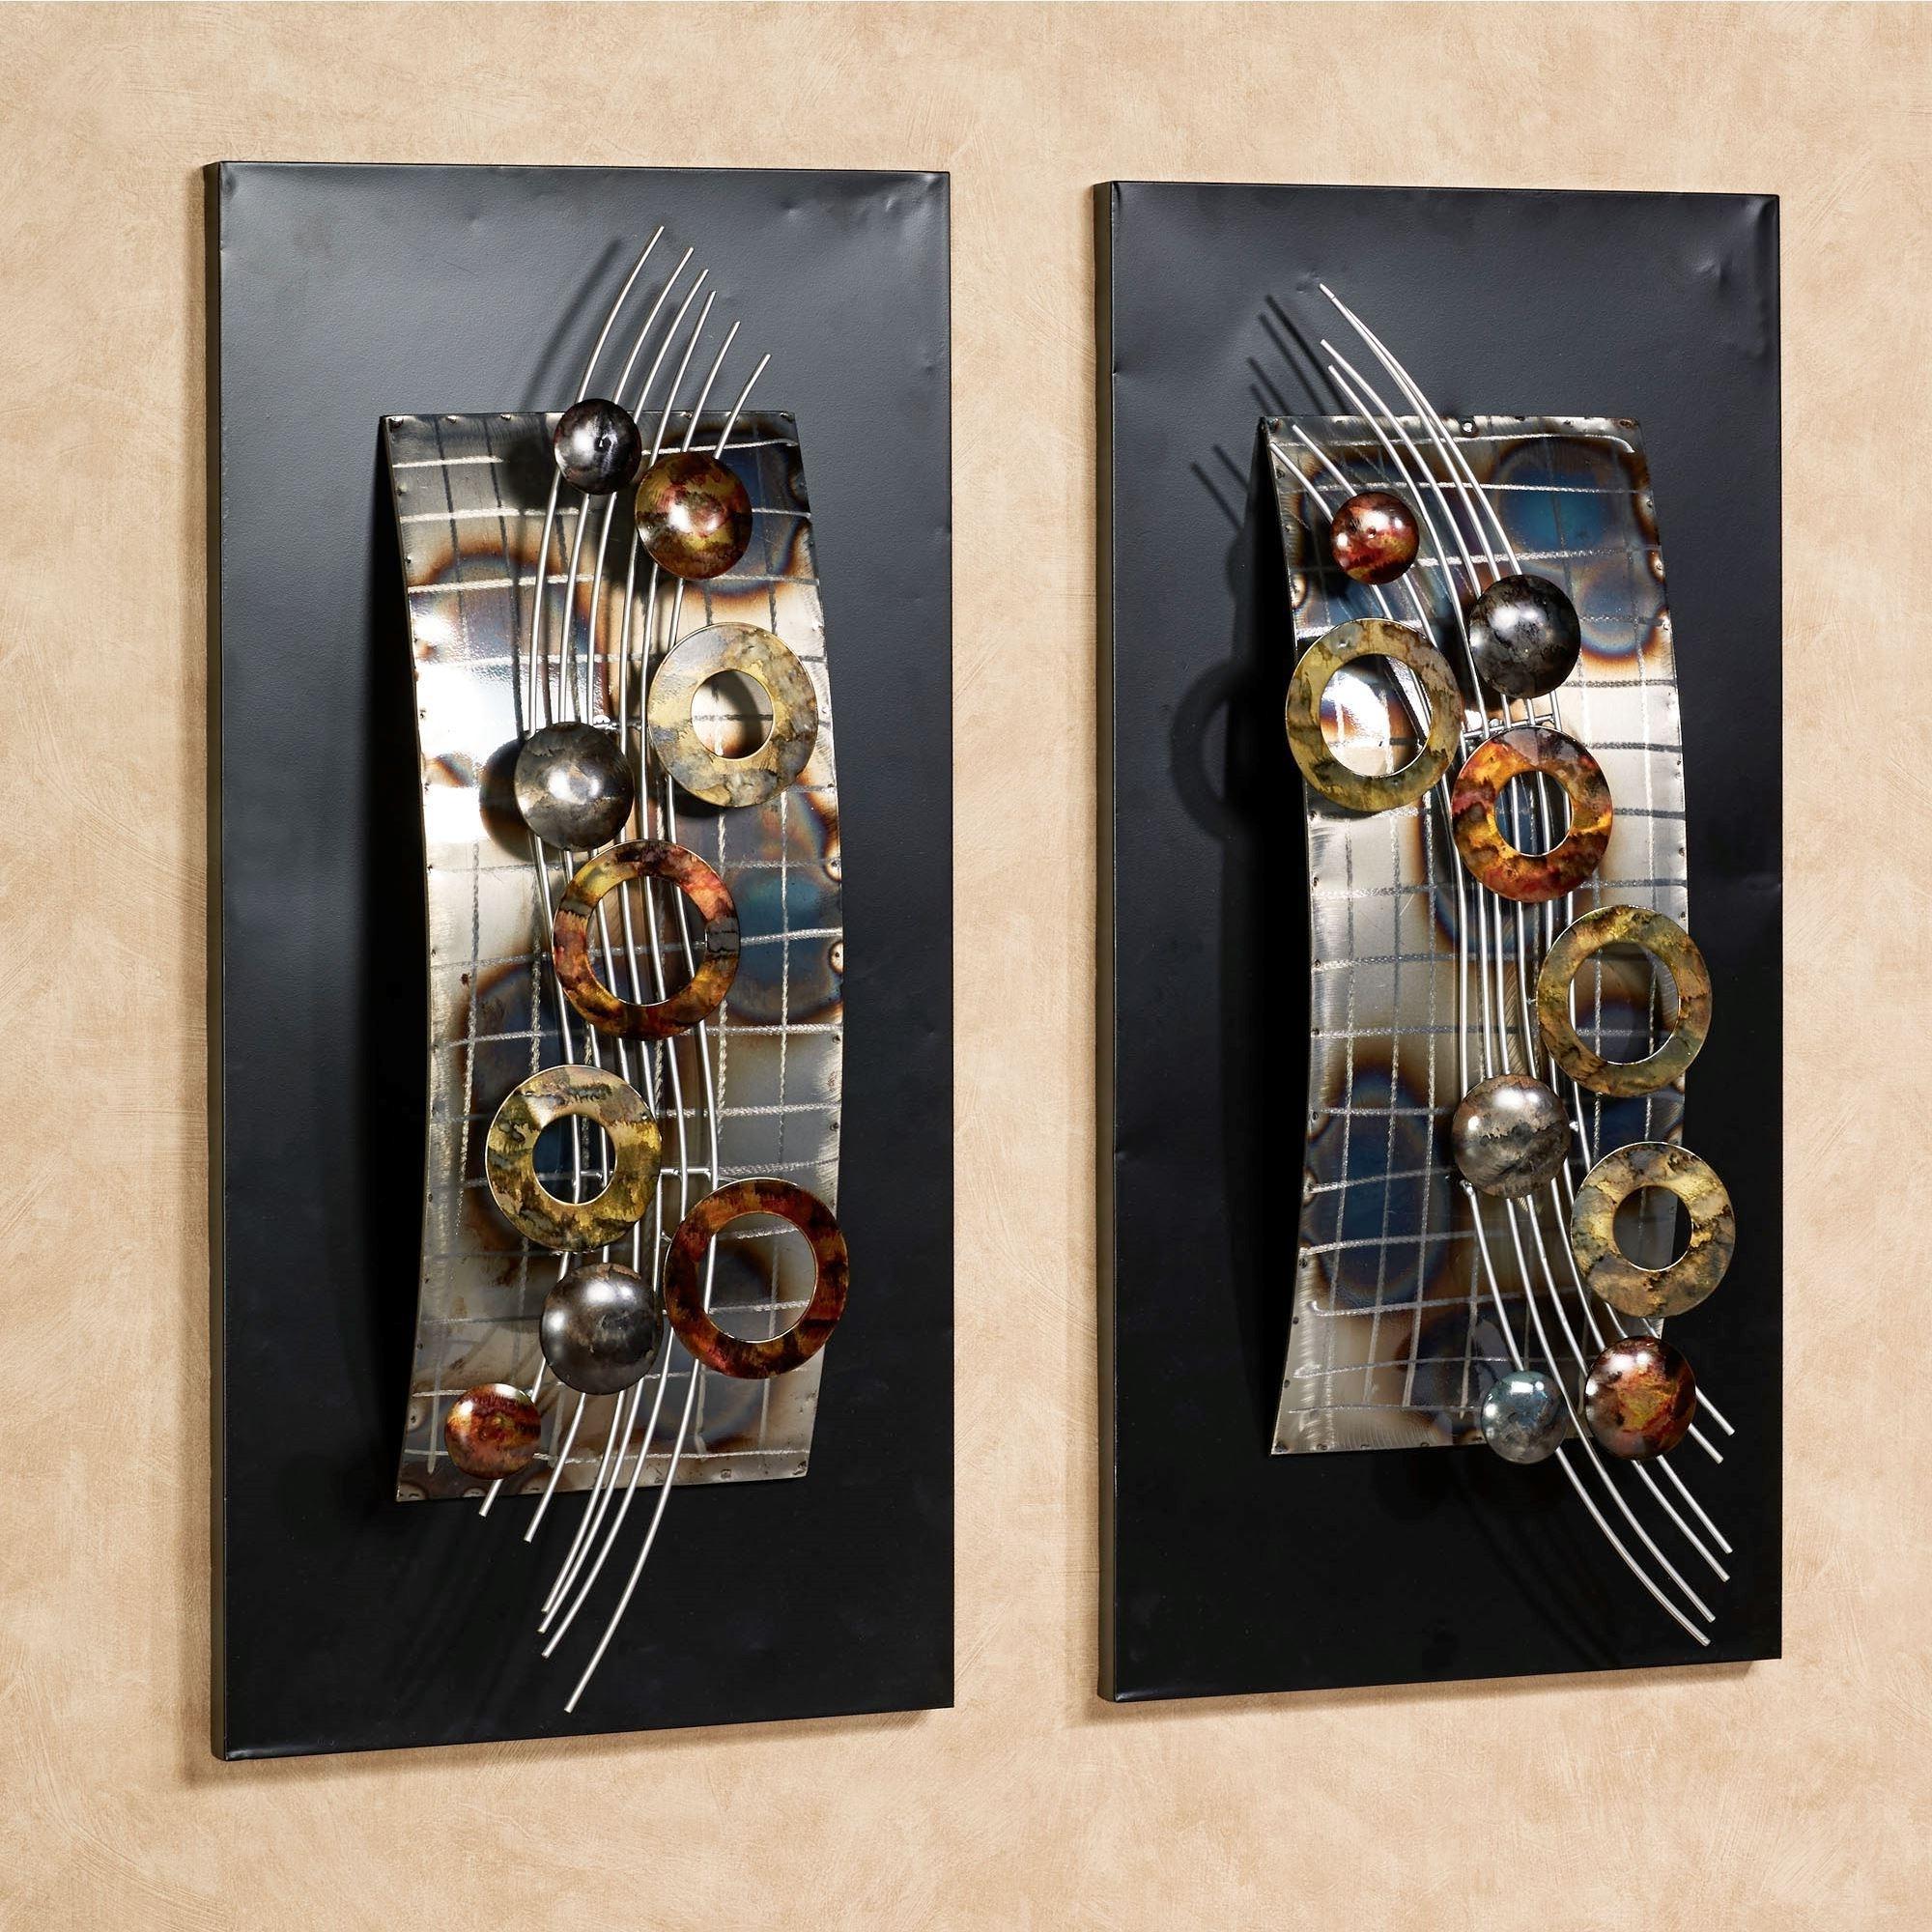 Metal Wall Art Panels – Outdoor Metal Wall Art Panels Outdoor With Regard To Widely Used Wall Art Panels (View 13 of 15)